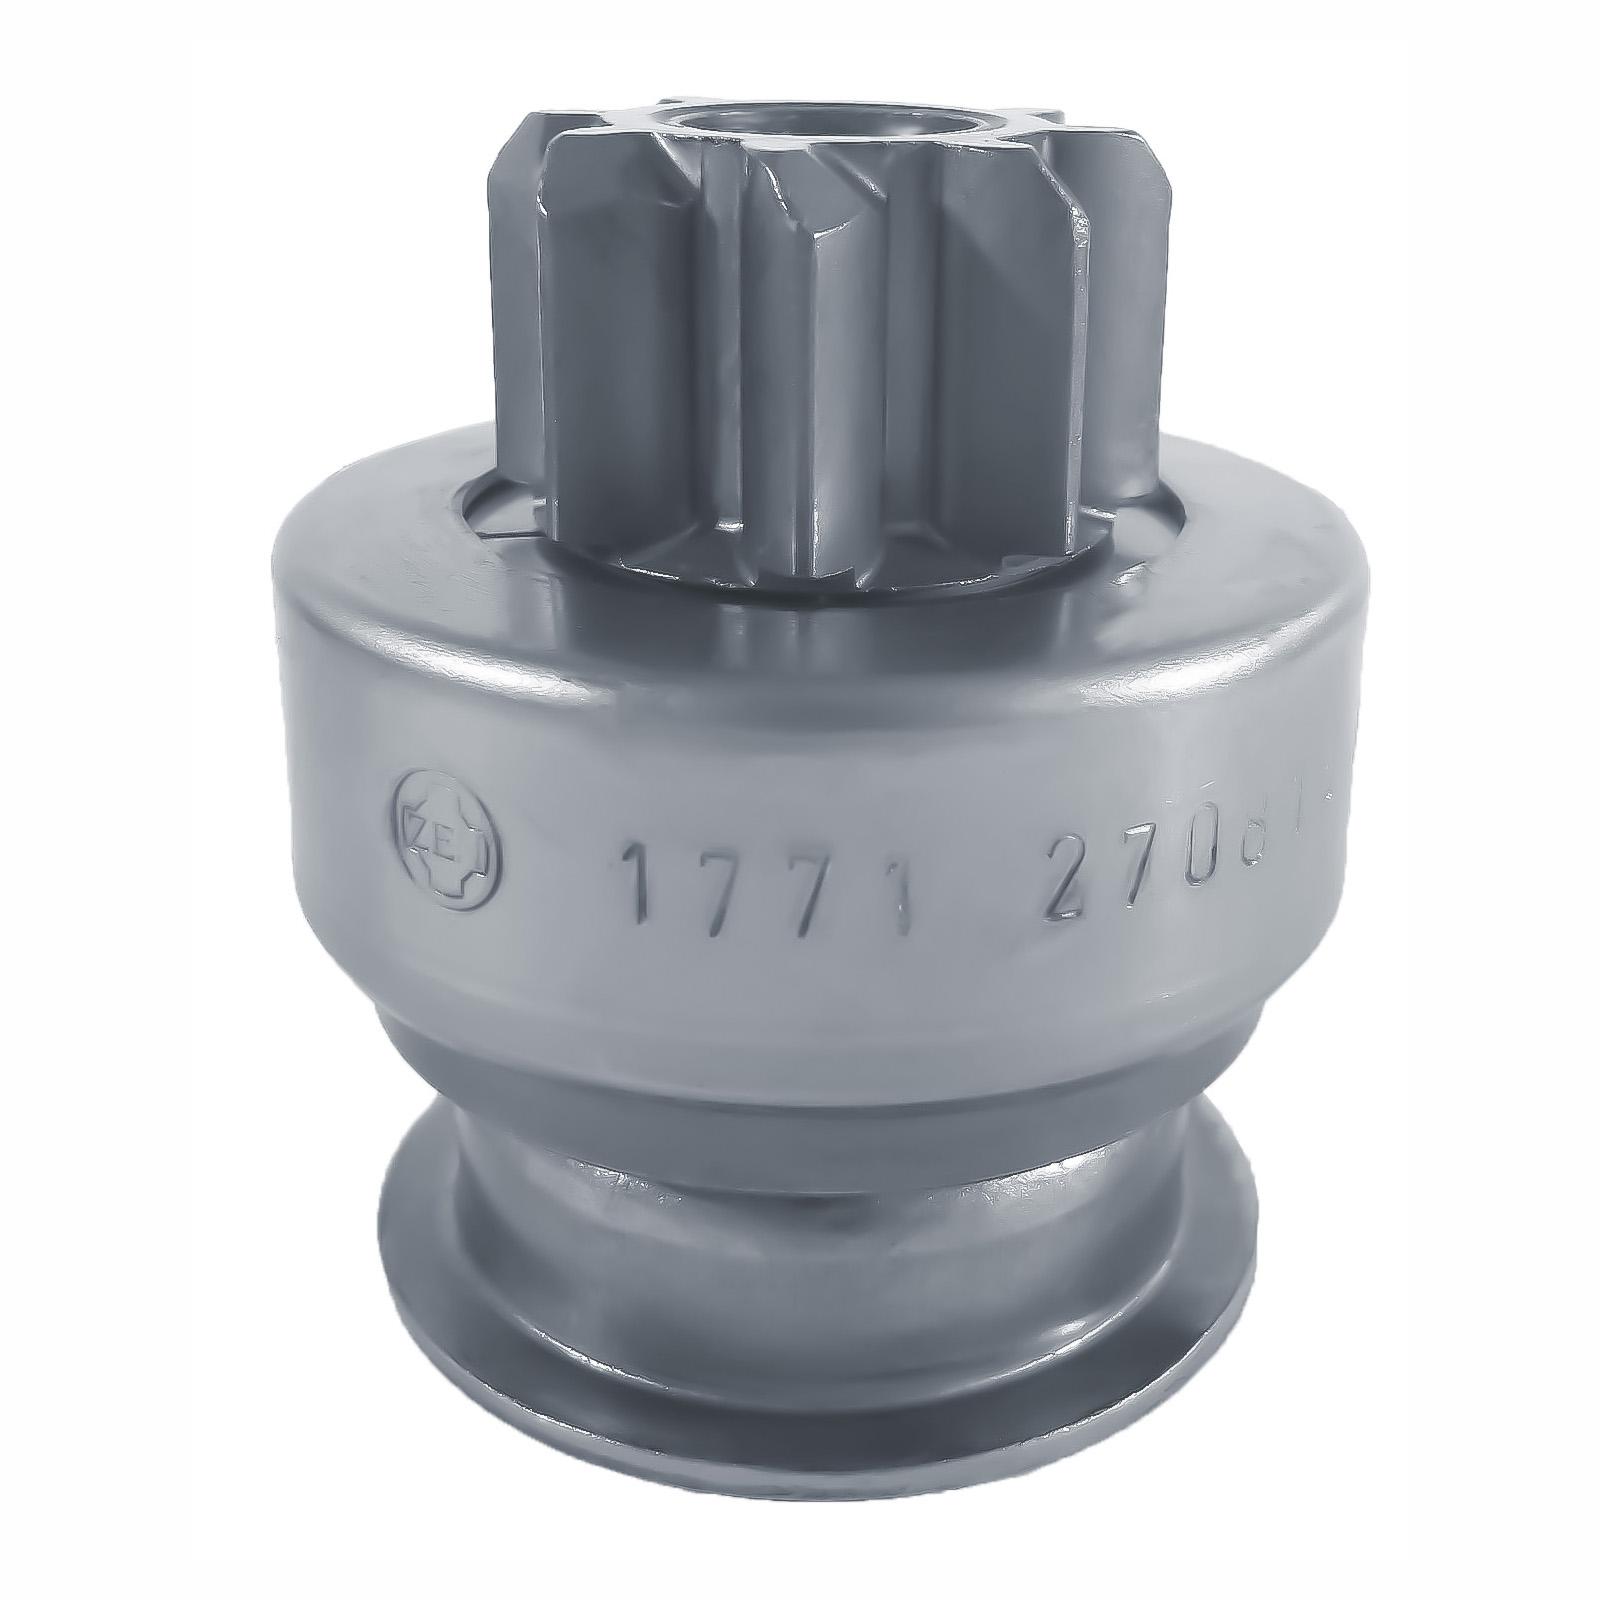 Bendix Motor de Partida FREEMONT SANTA FE - 8 Dentes (ZEN177